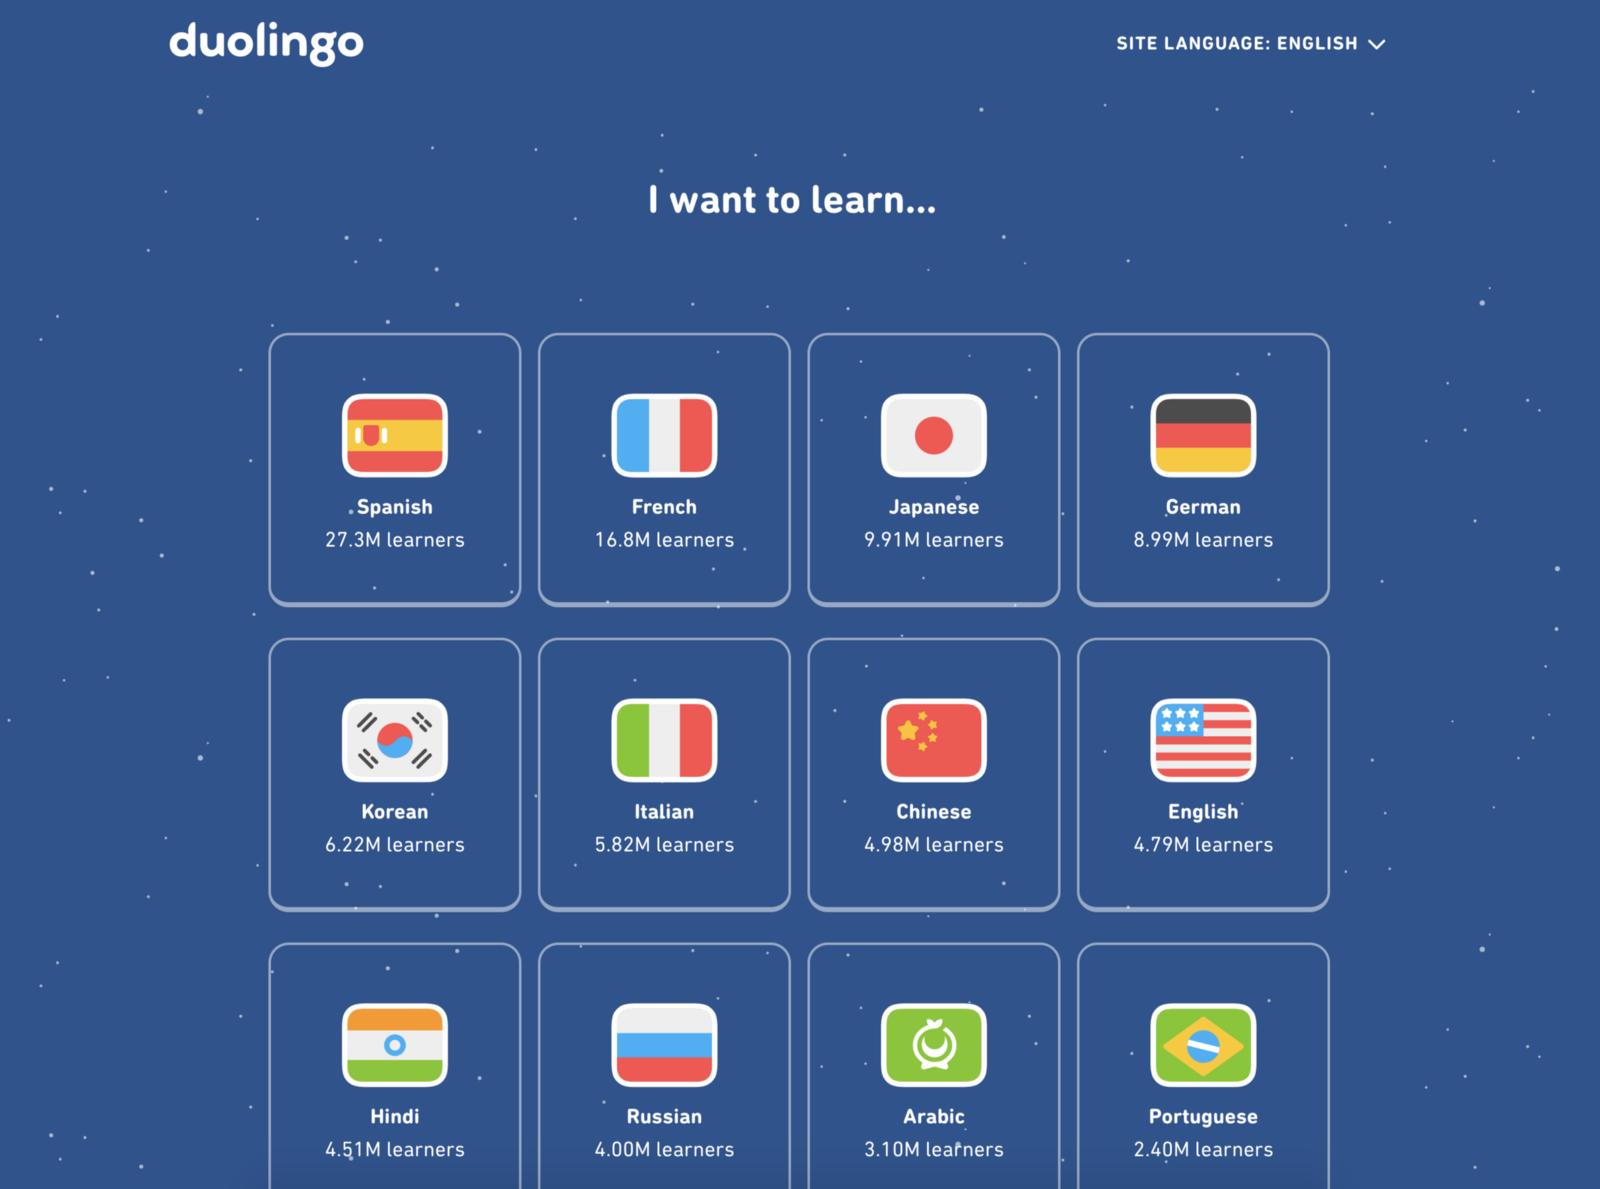 Duolingo landing page for choosing a language